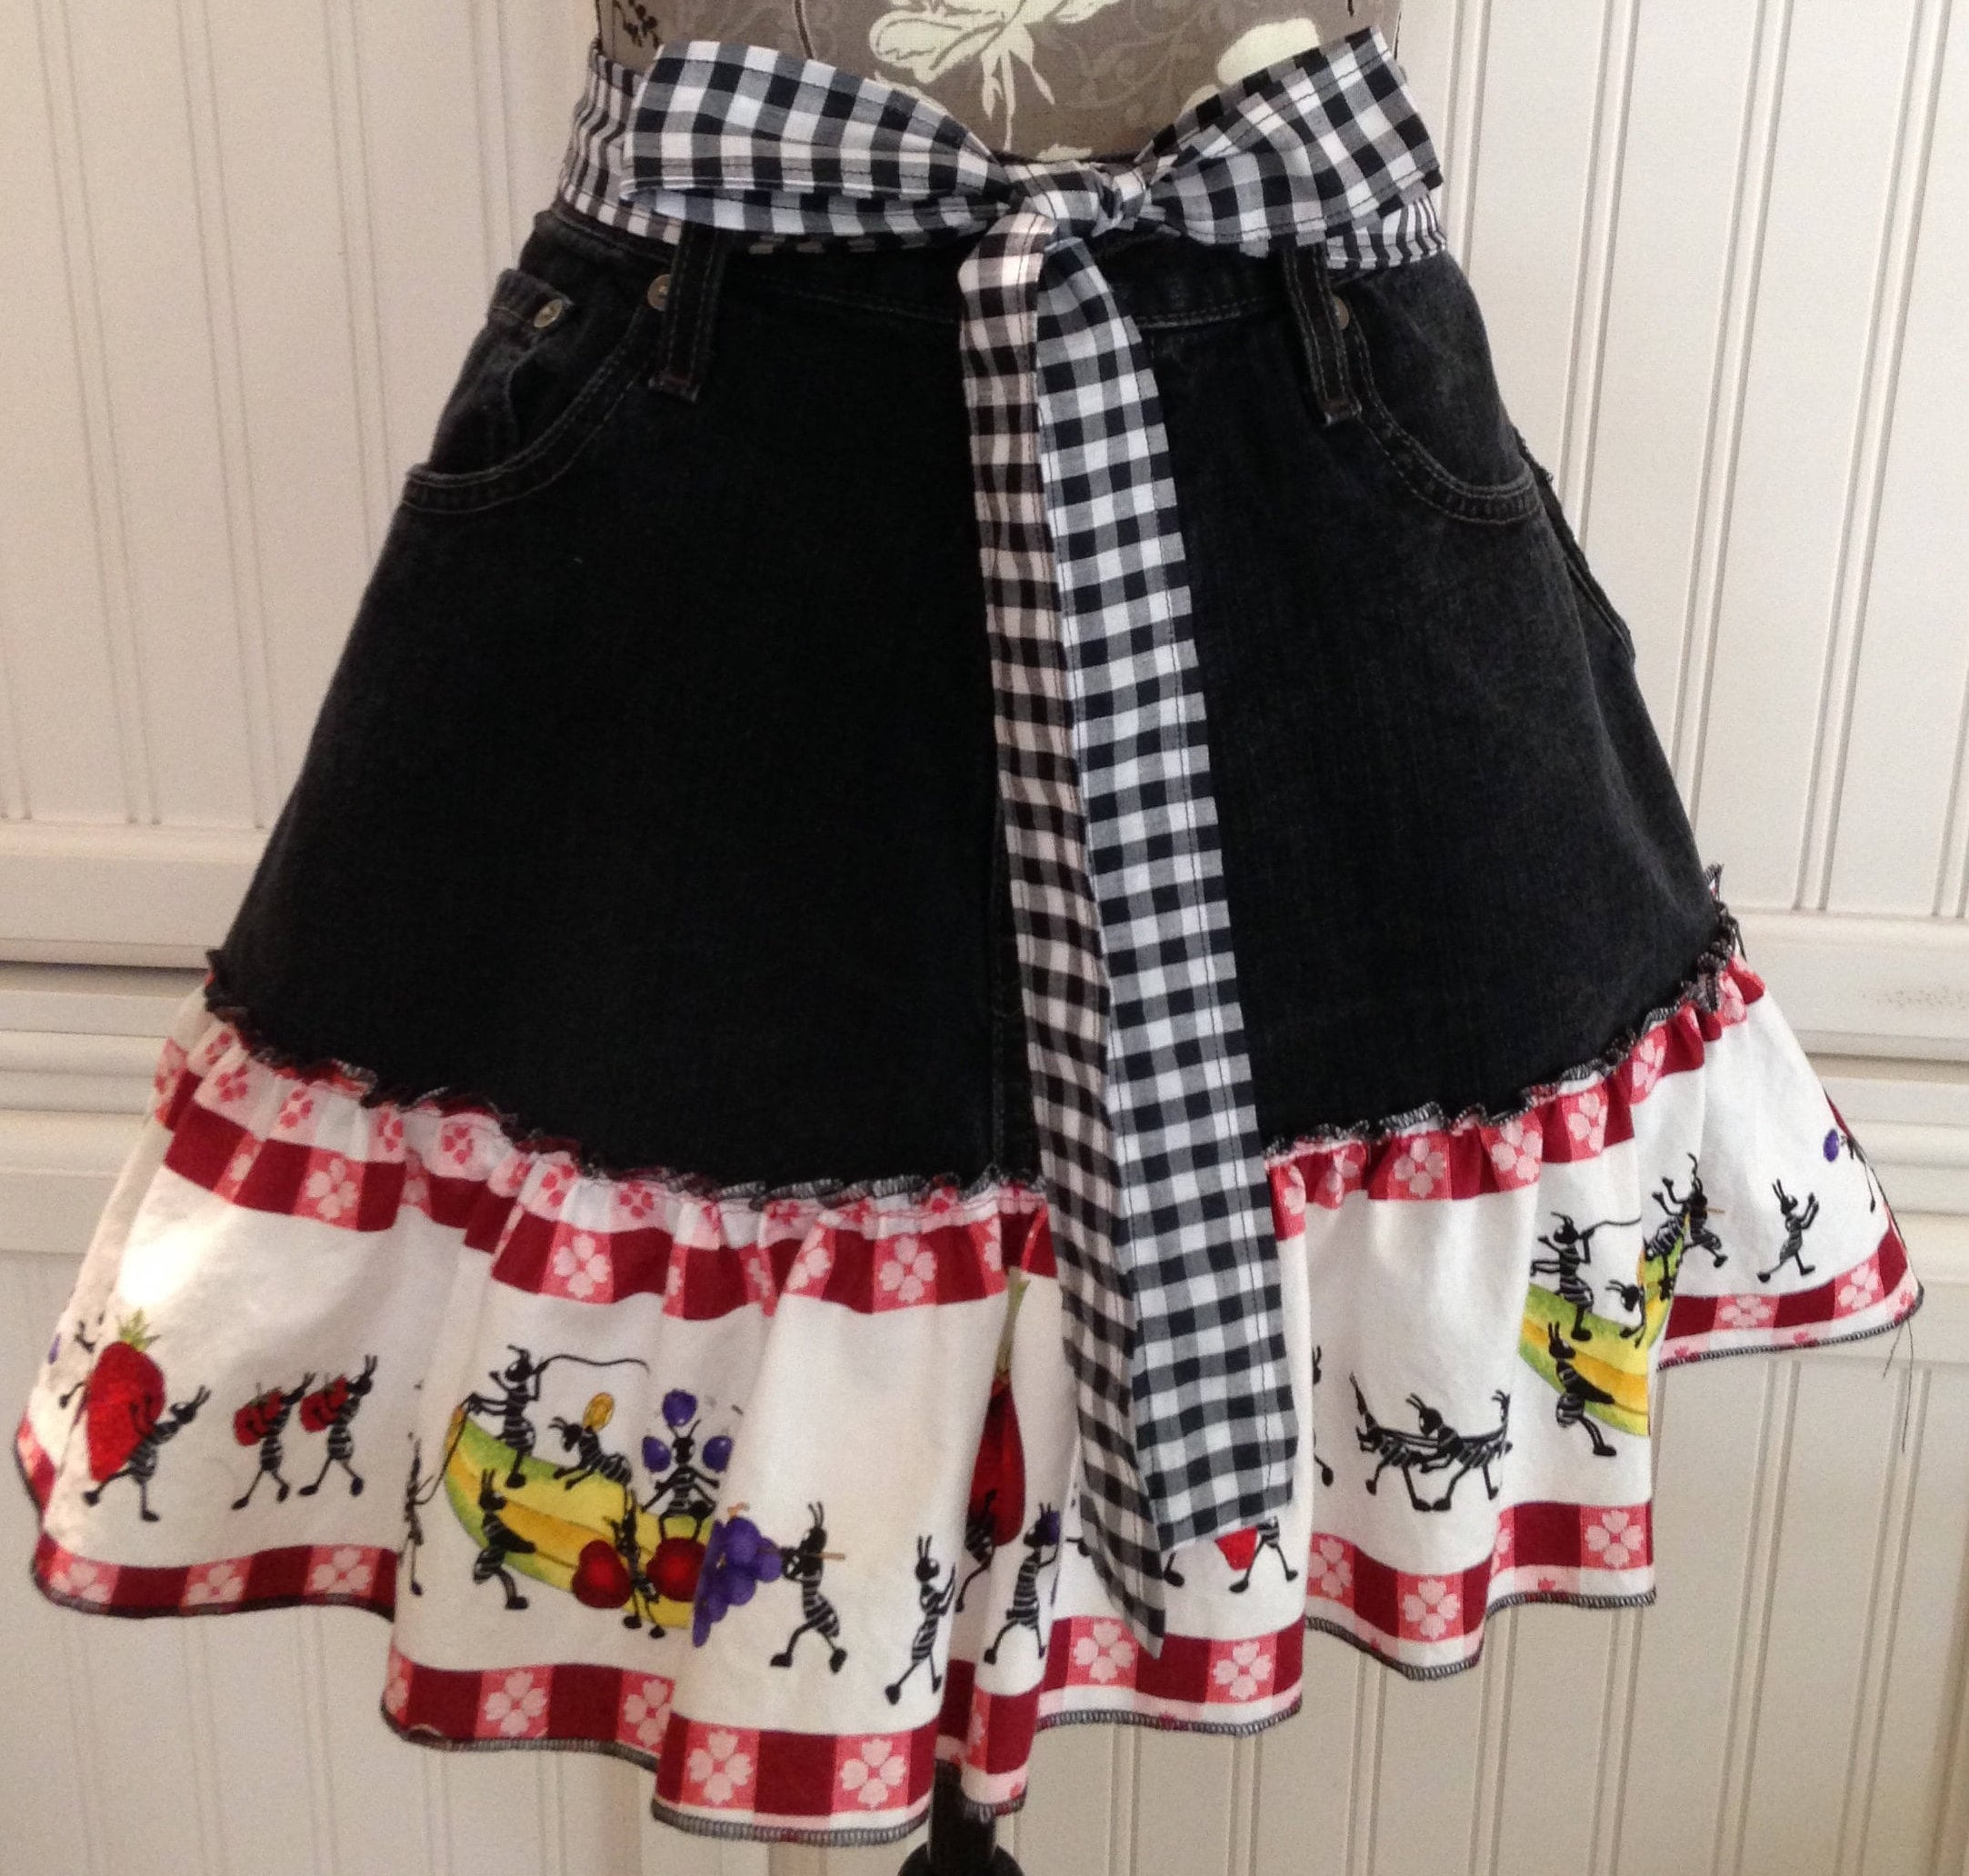 White half apron ruffle - Denim Half Apron Ant Picnic Ruffle Black Gingham Ties Long Waist Ties Black Denim Apron Women S Half Apron Repurposed Denim Picnic